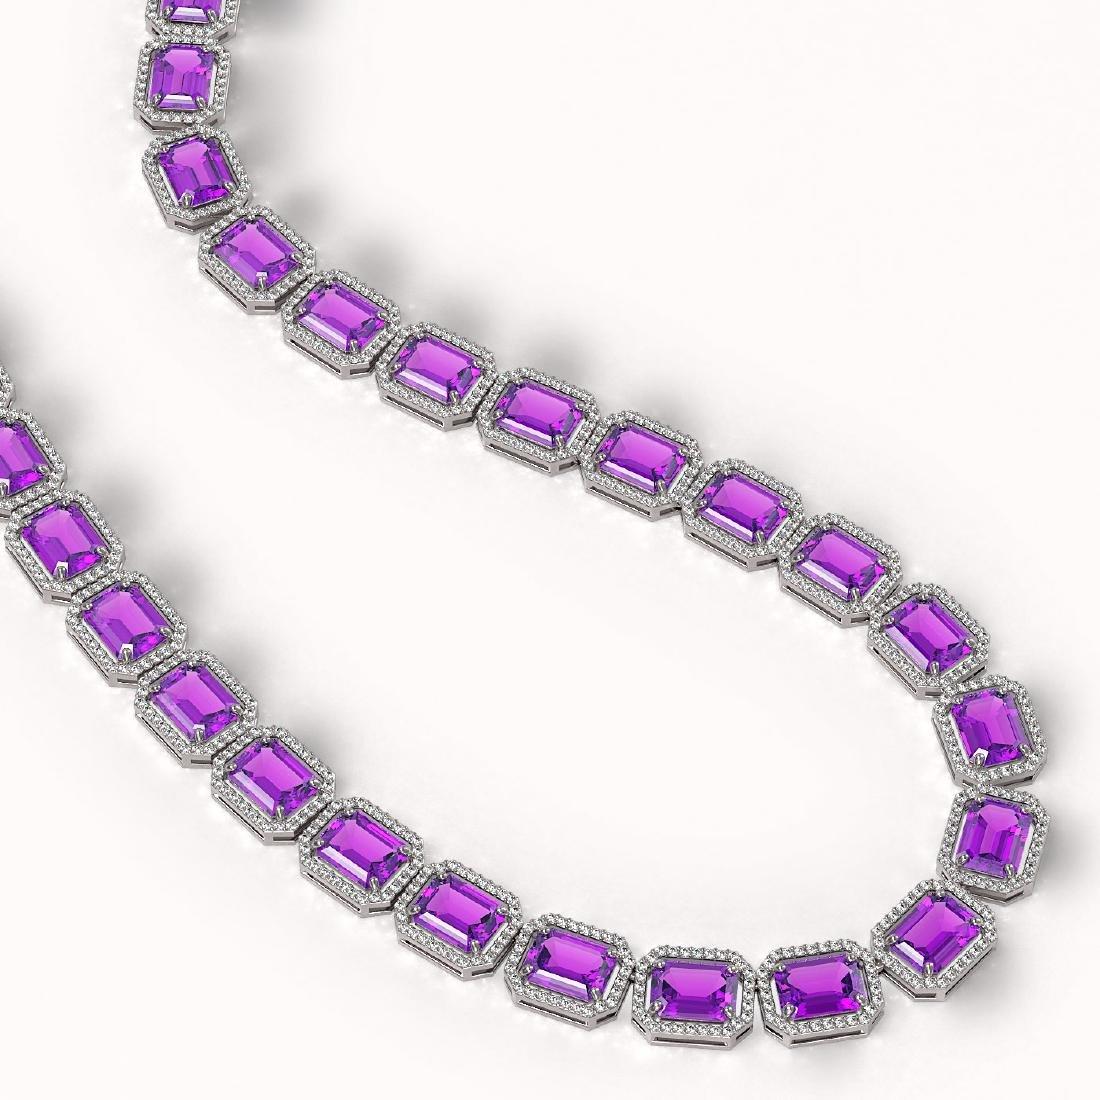 76.69 CTW Amethyst & Diamond Halo Necklace 10K White - 2